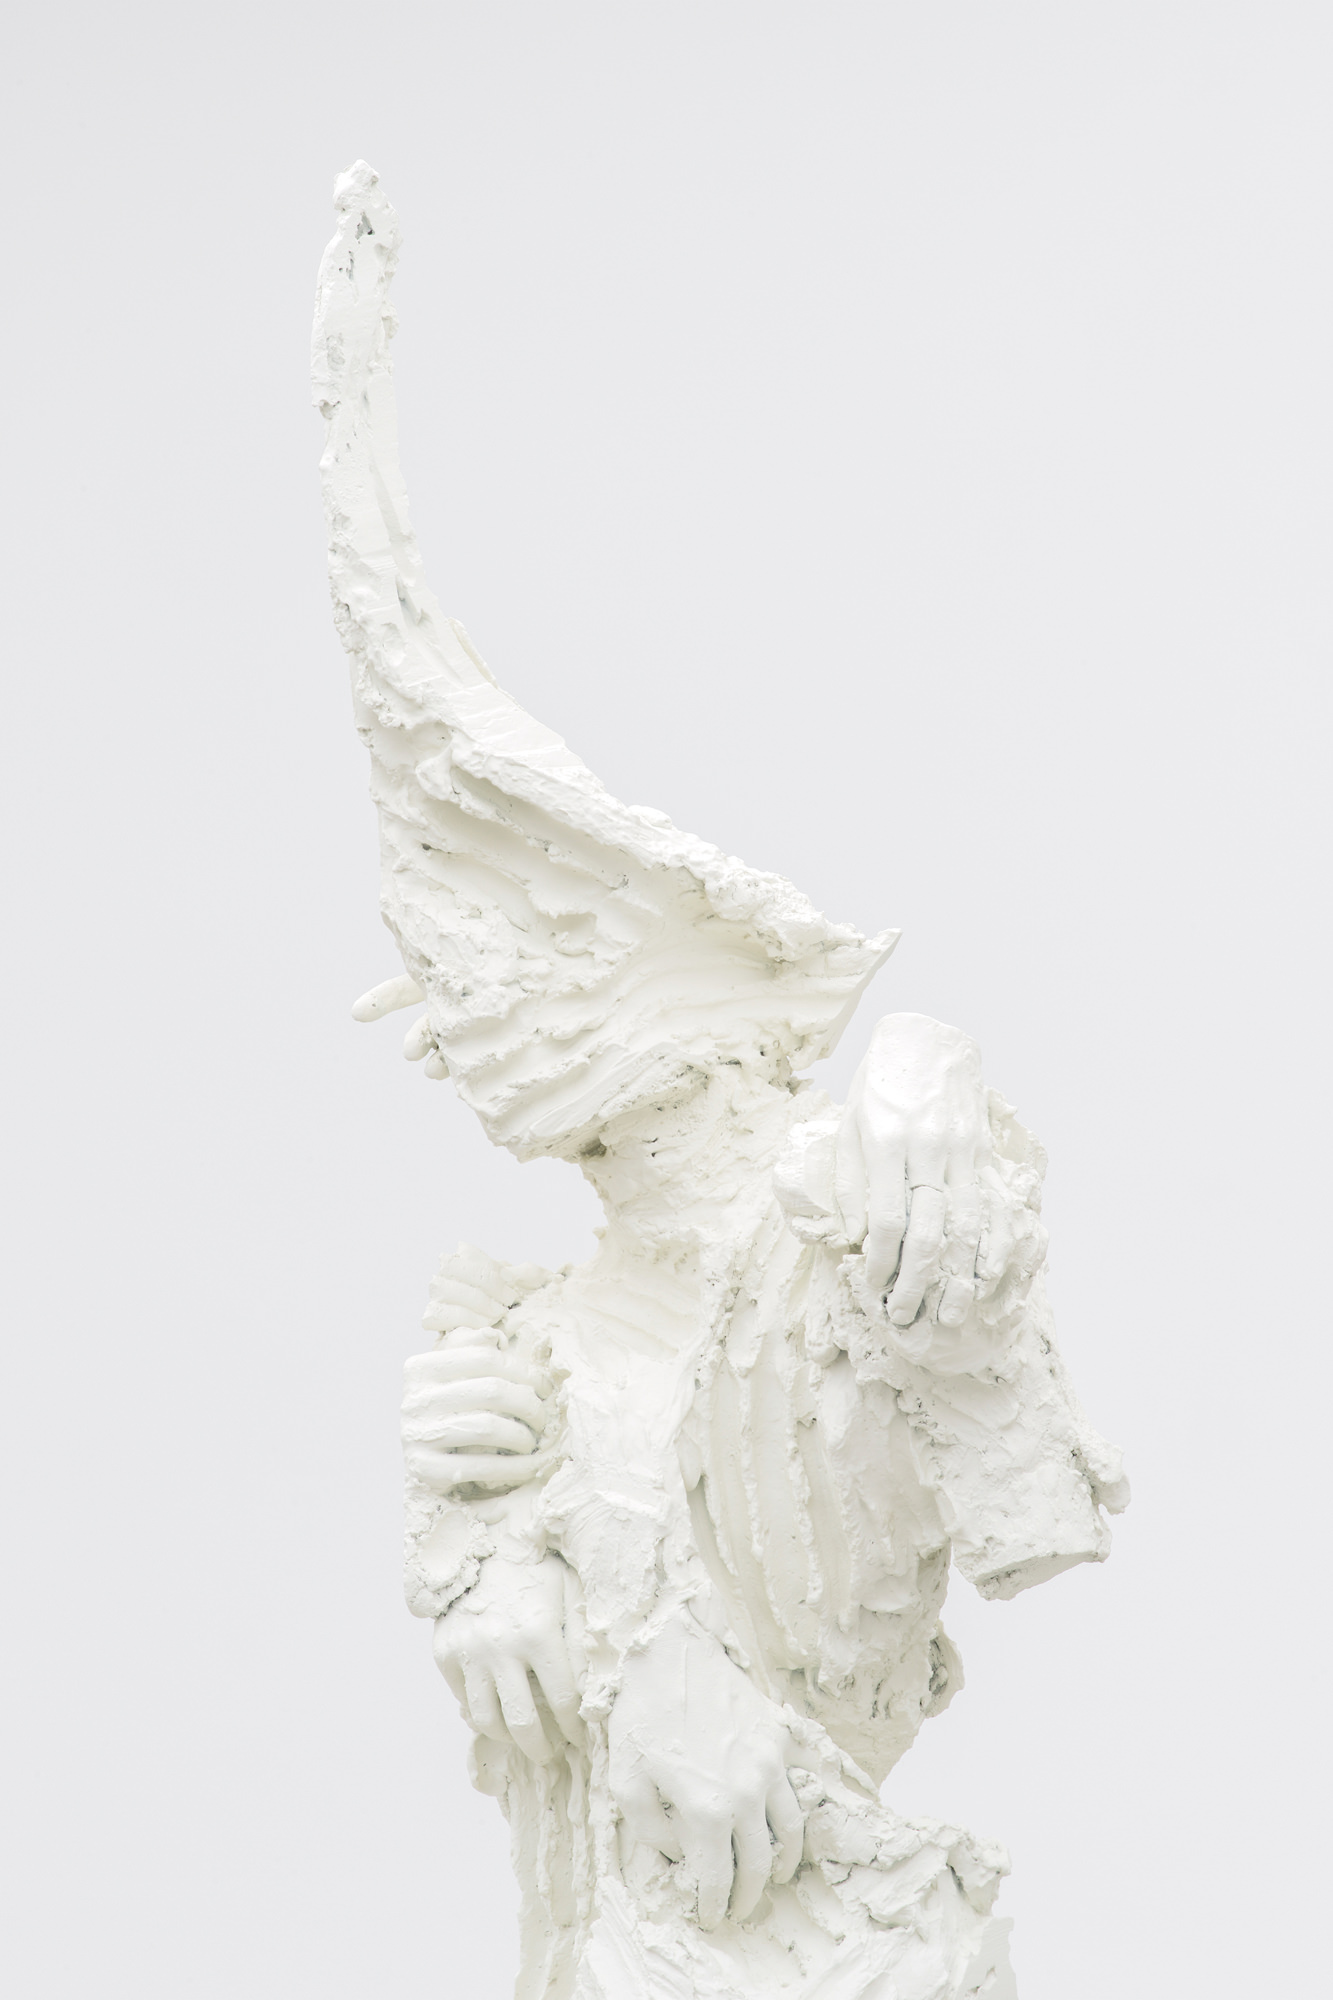 La Licorne (2016) by David Altmejd (detail), bronze, 223 x 97.5 x 80 cm.